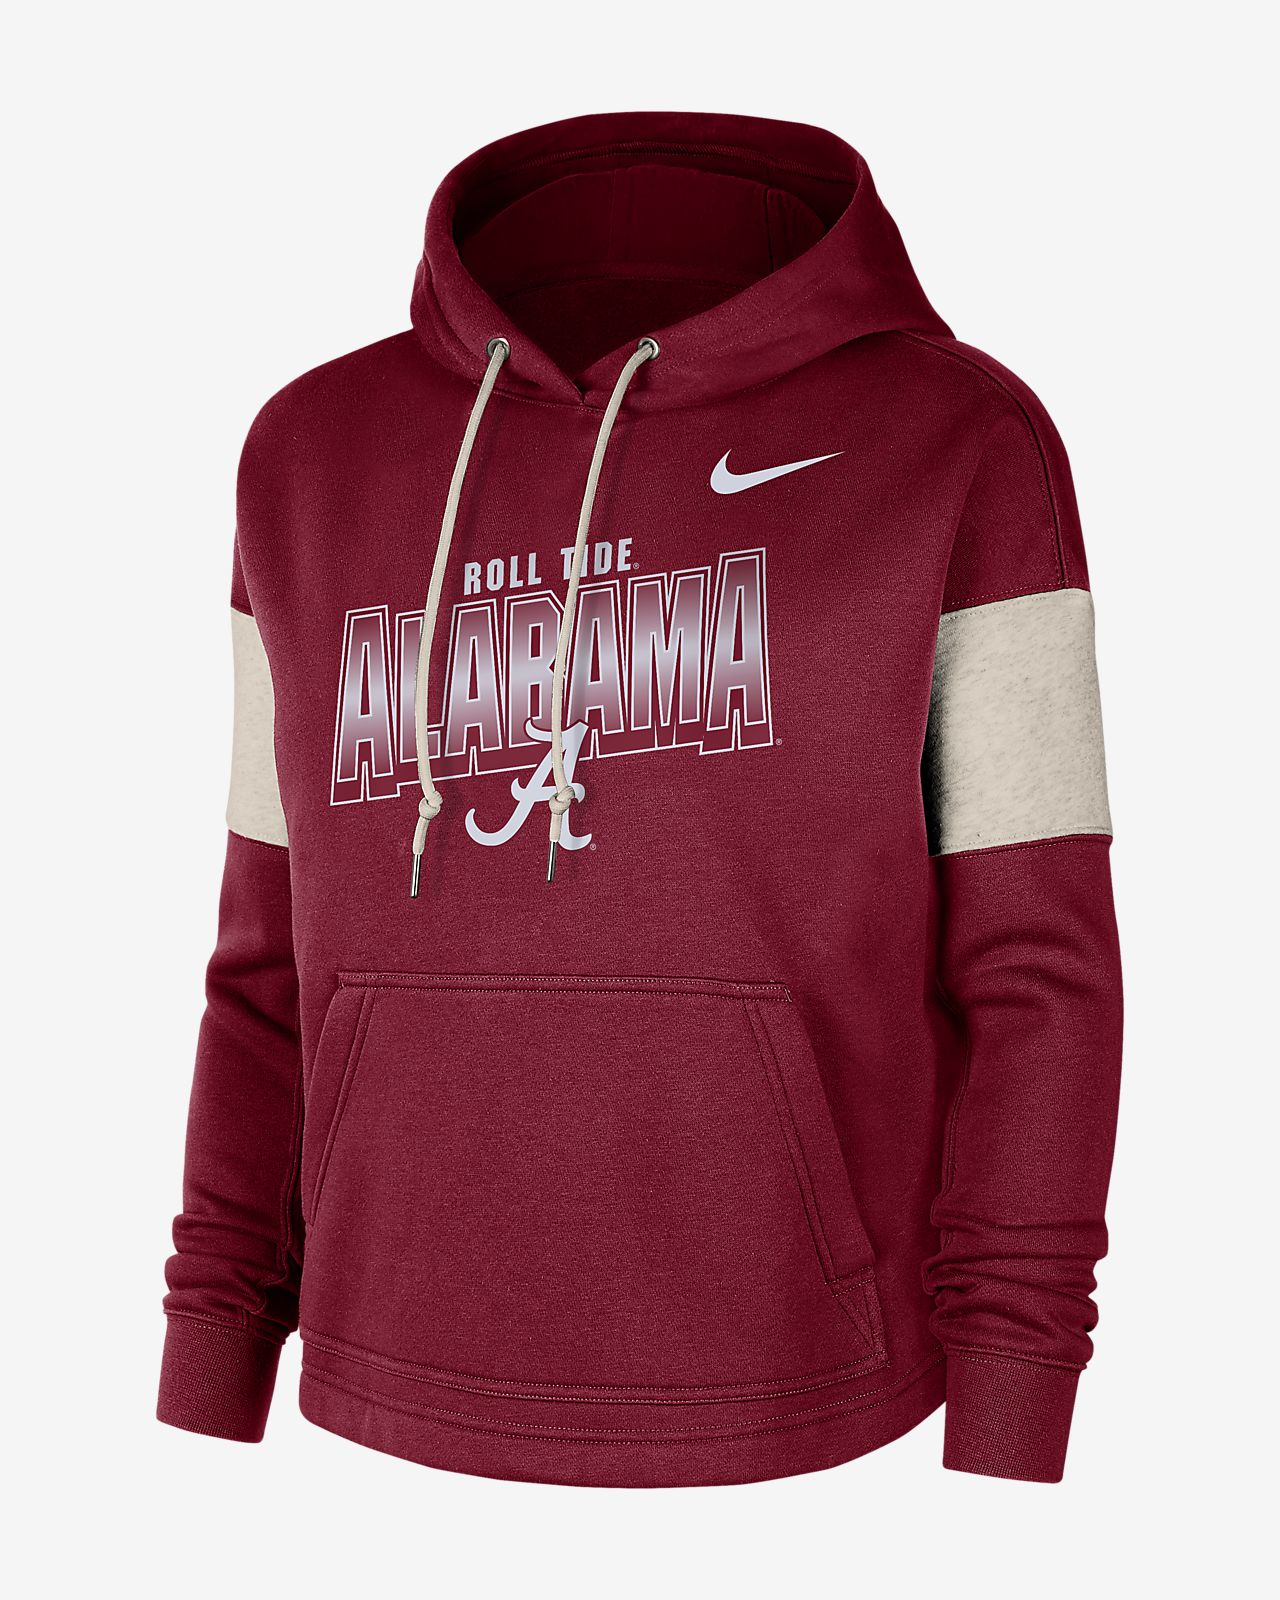 Alabama Crimson Tide Nike Therma Pullover Hoodie